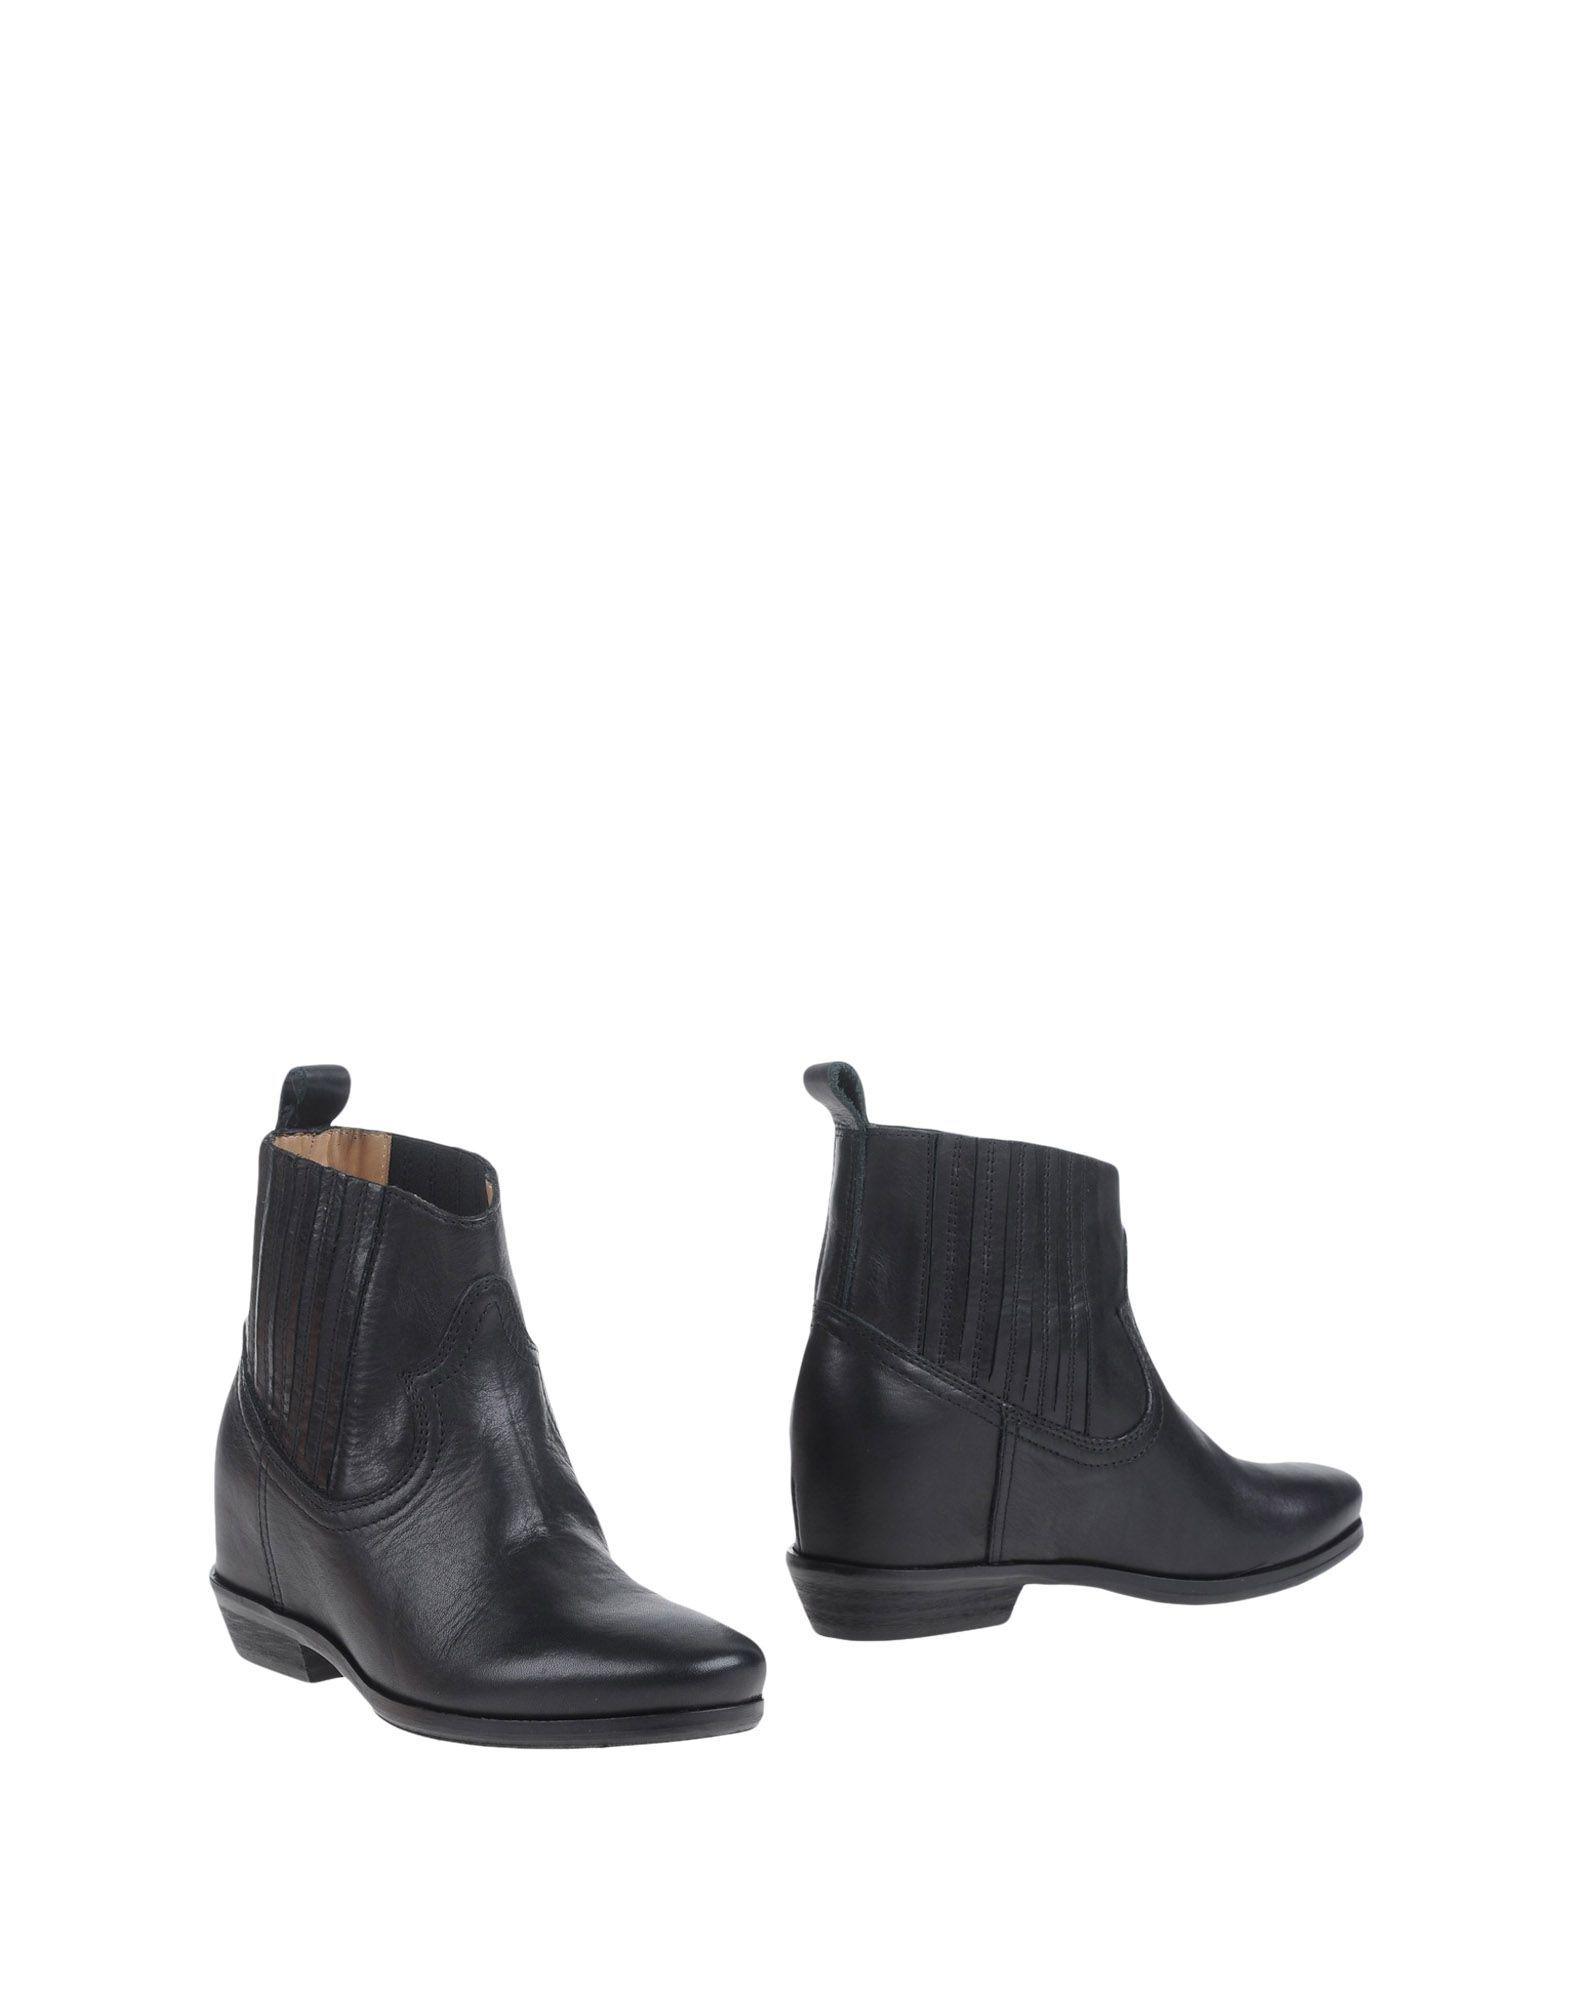 Footwear Liviana Conti Black Women's Leather